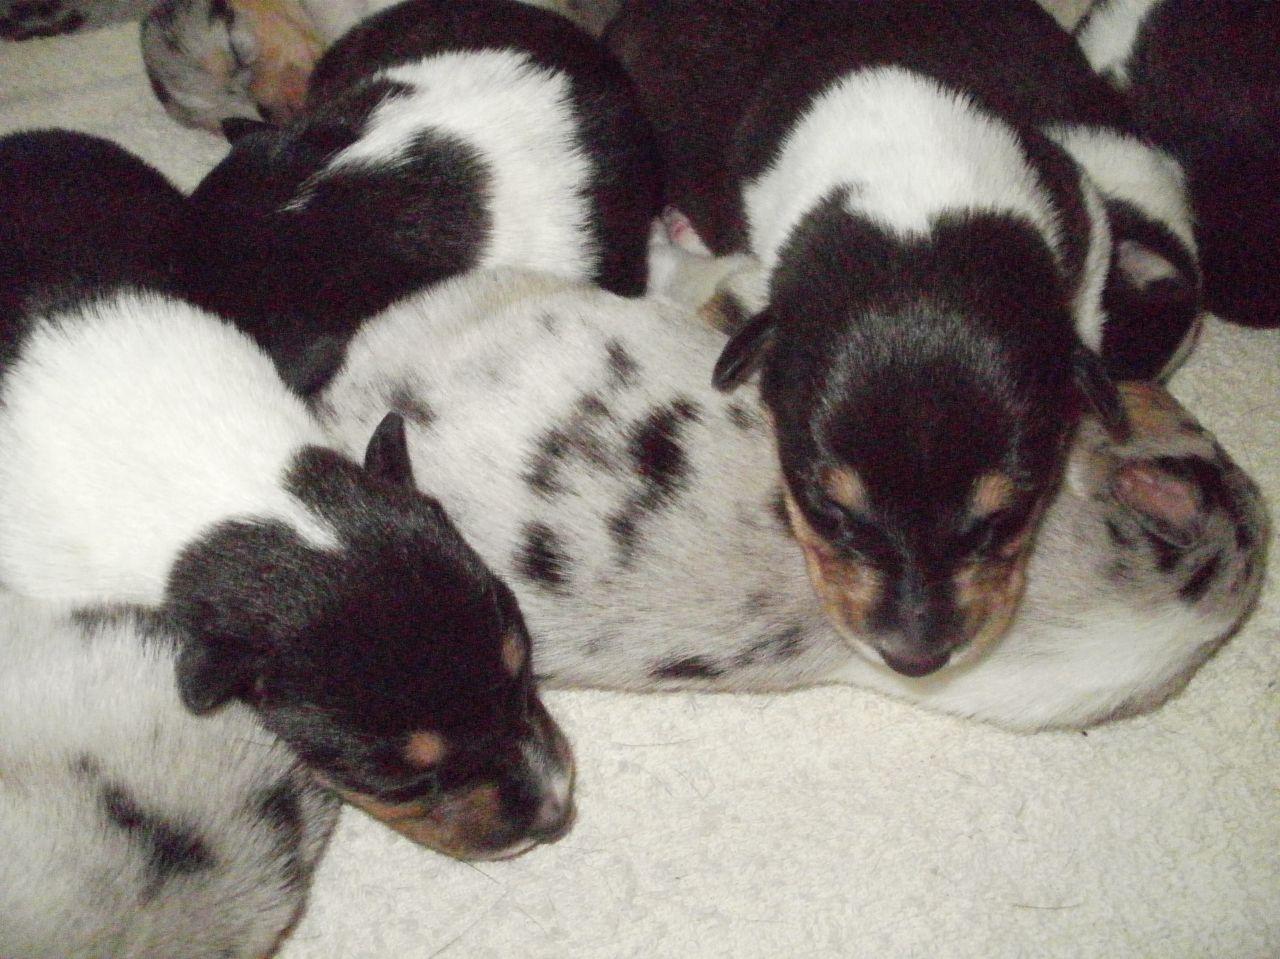 Collie, Smooth Puppies: Collie, Smooth Collie Puppies Herne Bay Breed